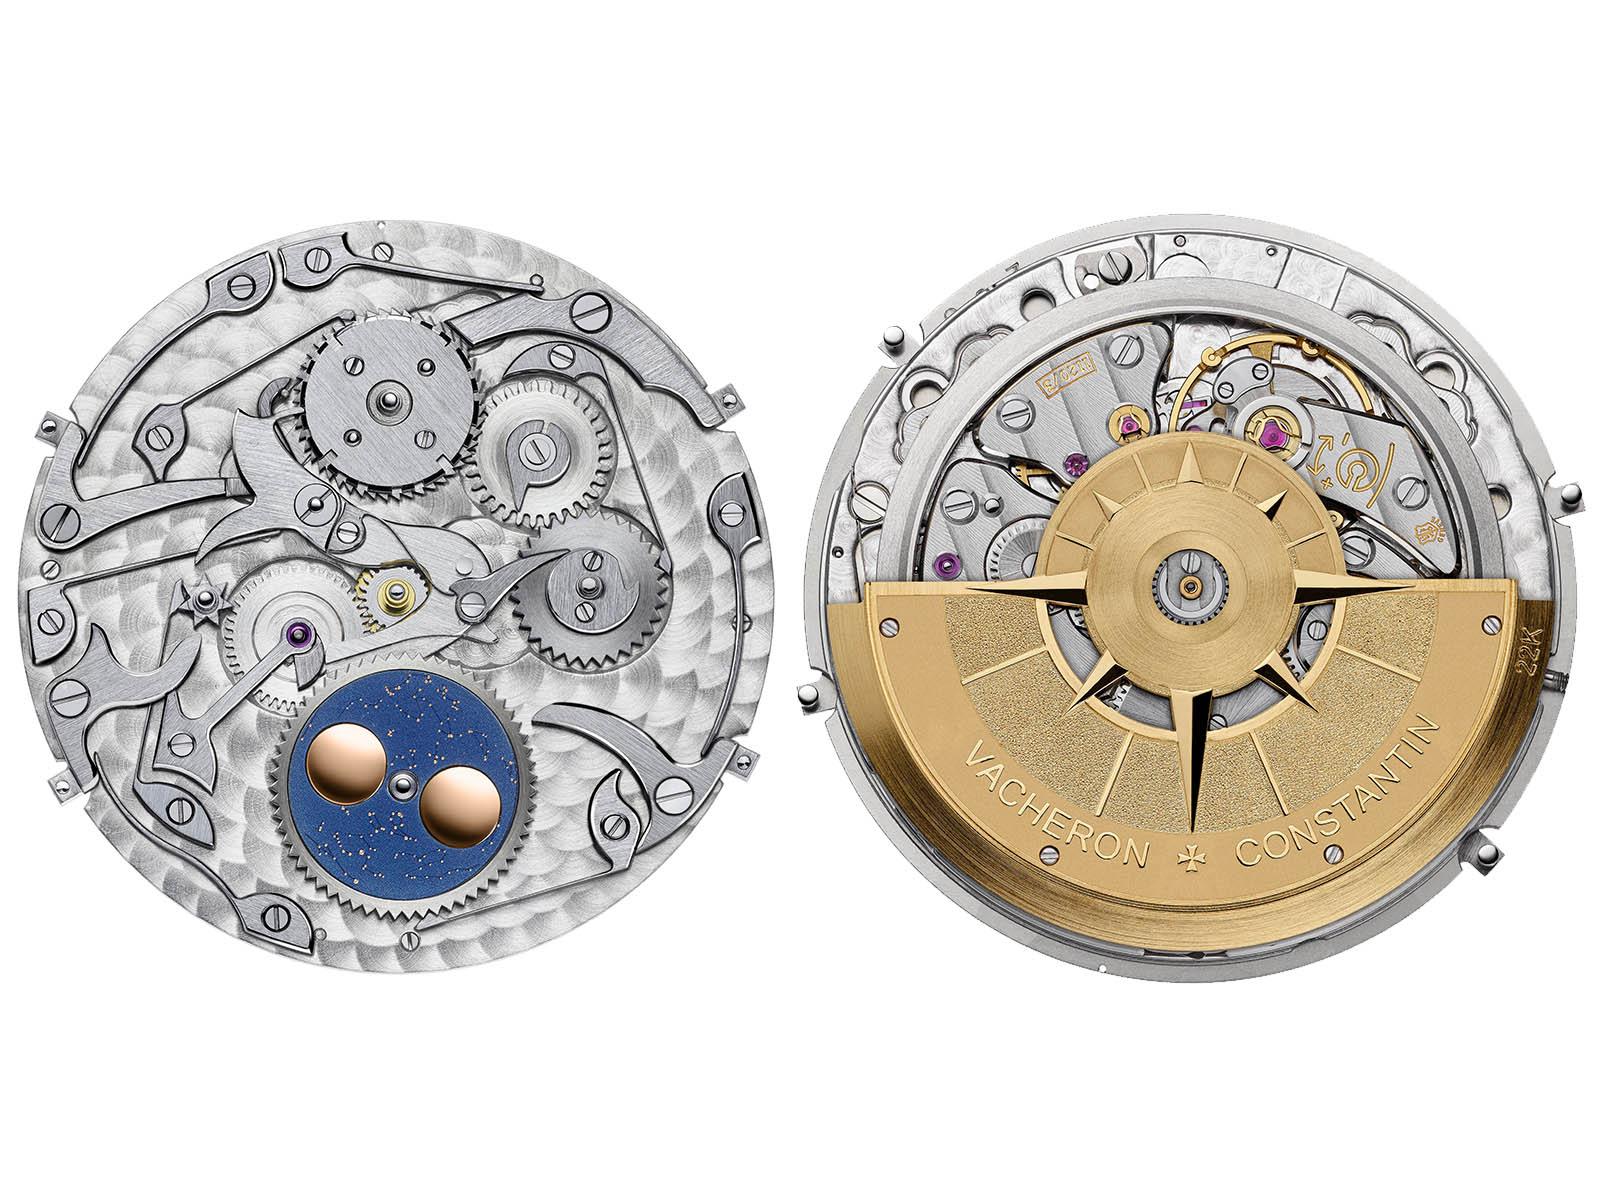 4300v-120r-b509-vacheron-constantin-overseas-perpetual-calendar-ultra-thin-6.jpg